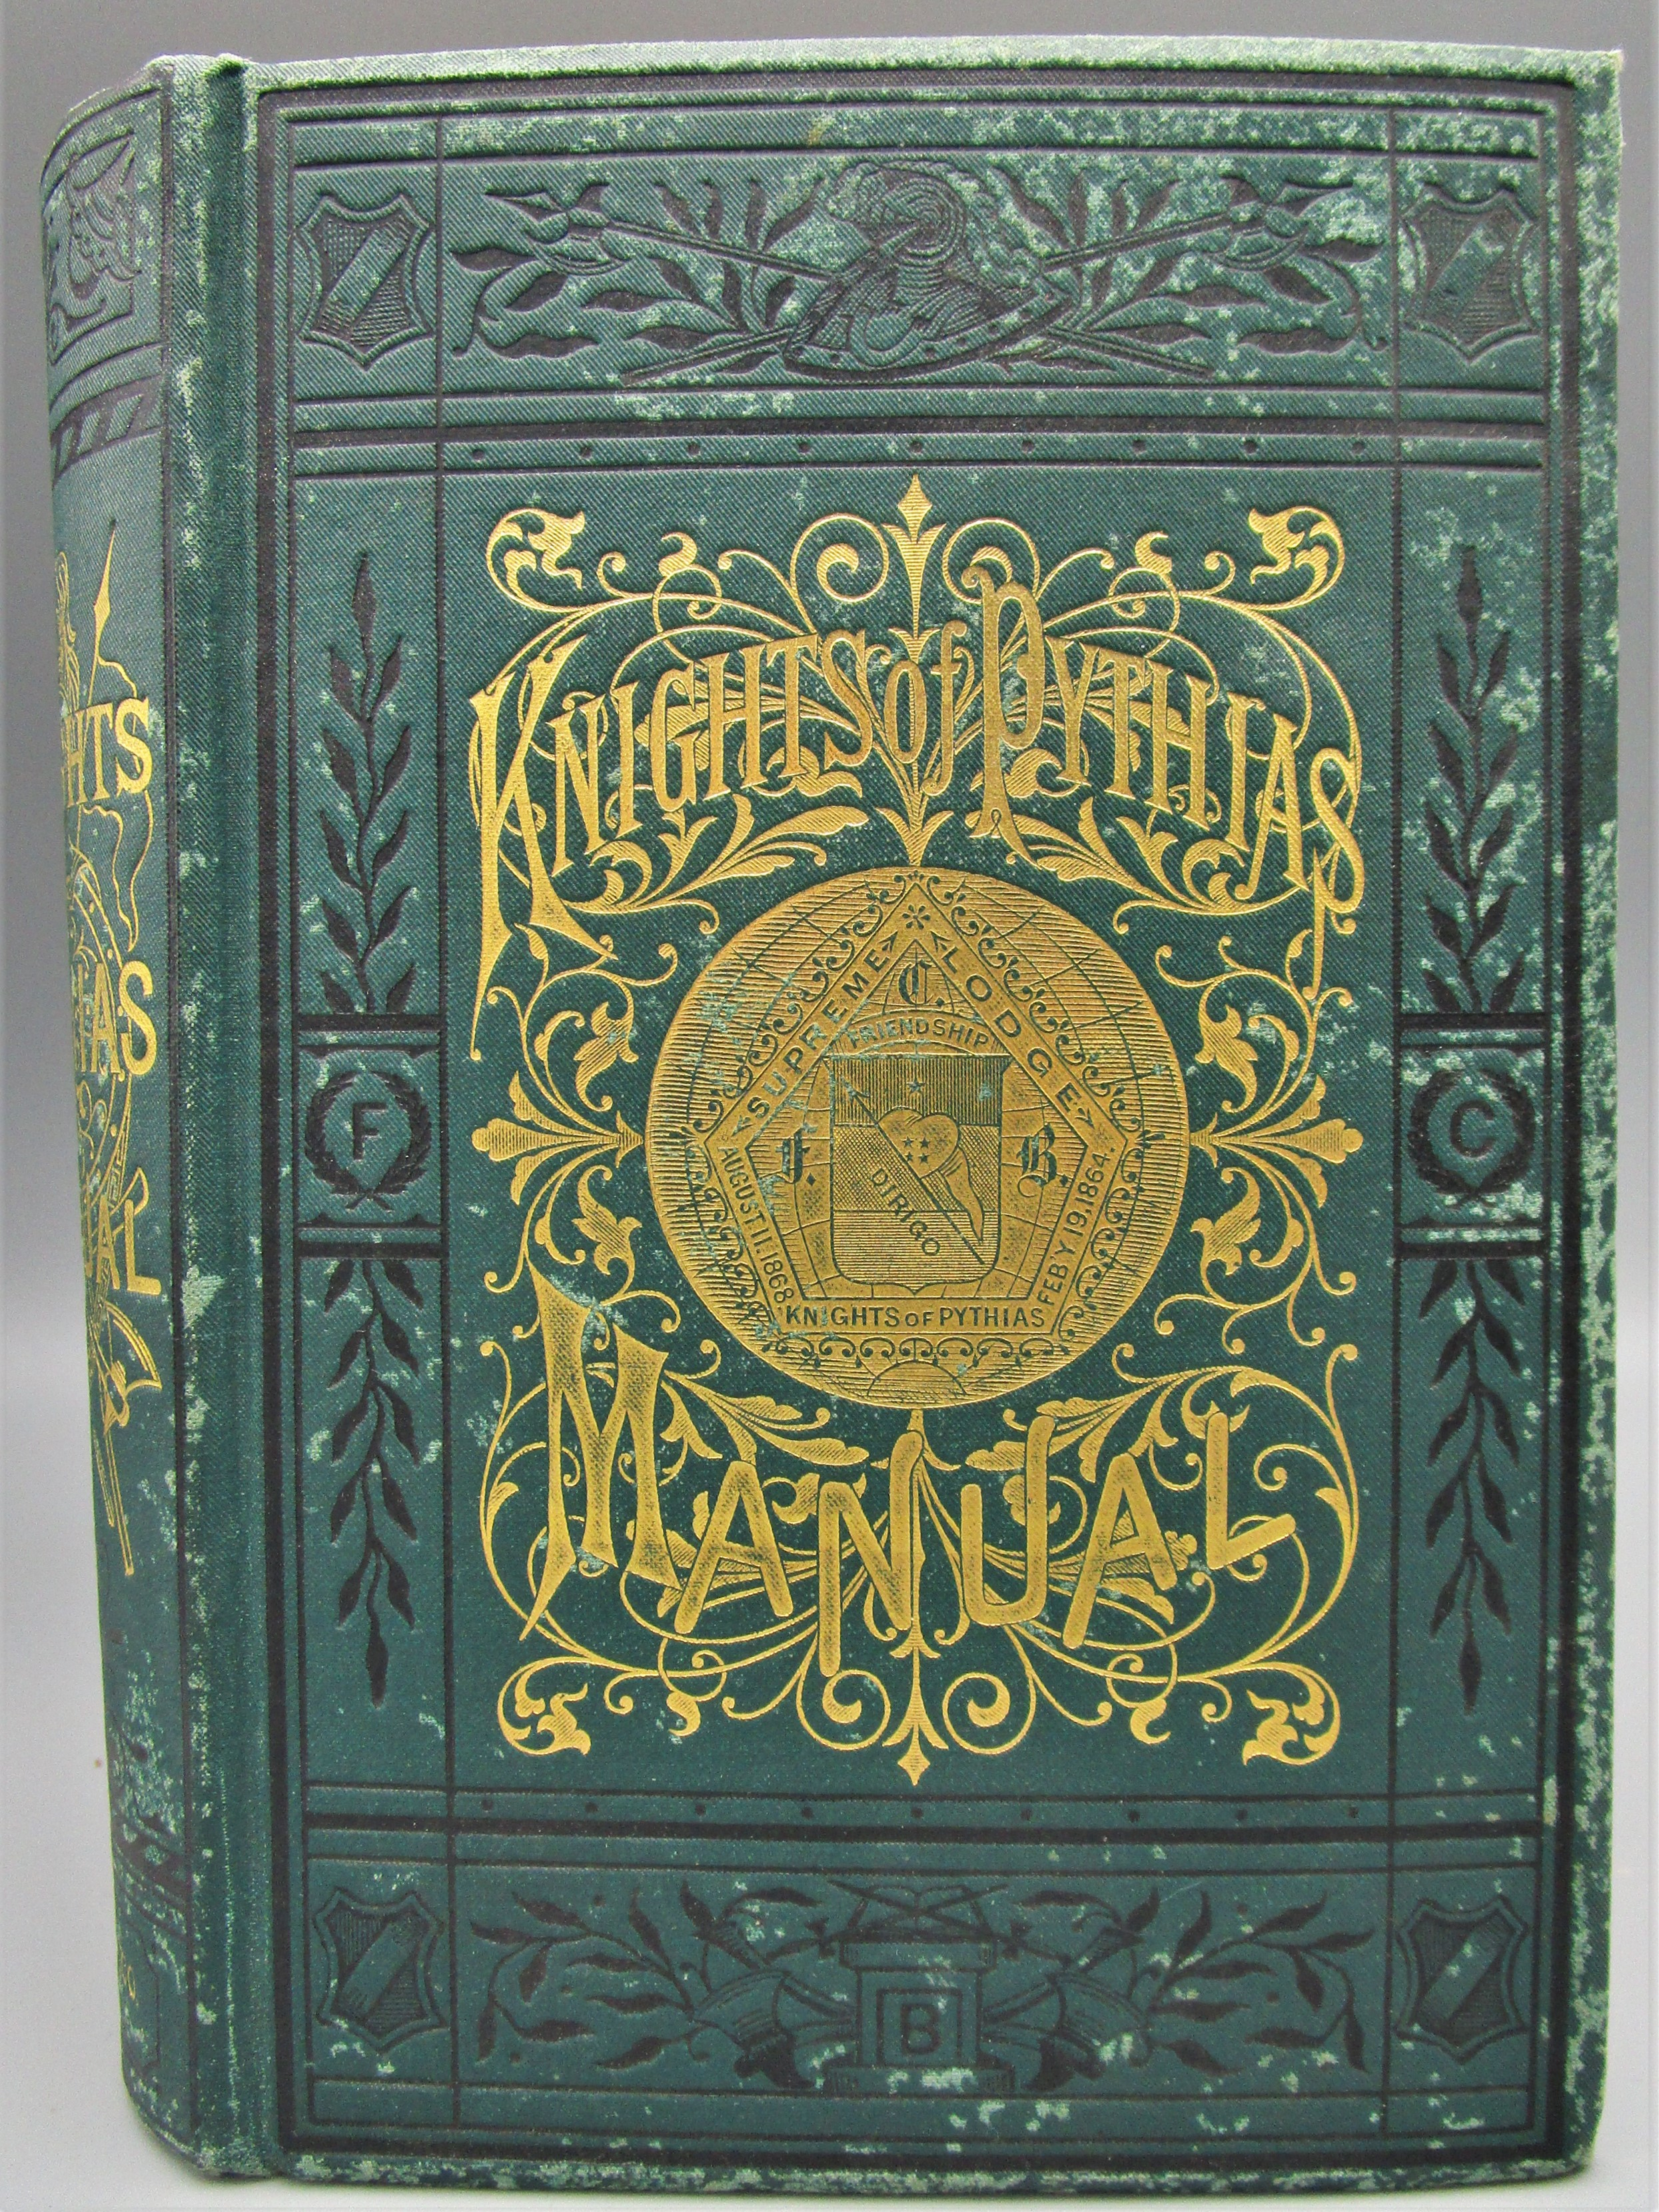 KNIGHTS OF PYTHIAS, by John Van Valkenburg - 1878